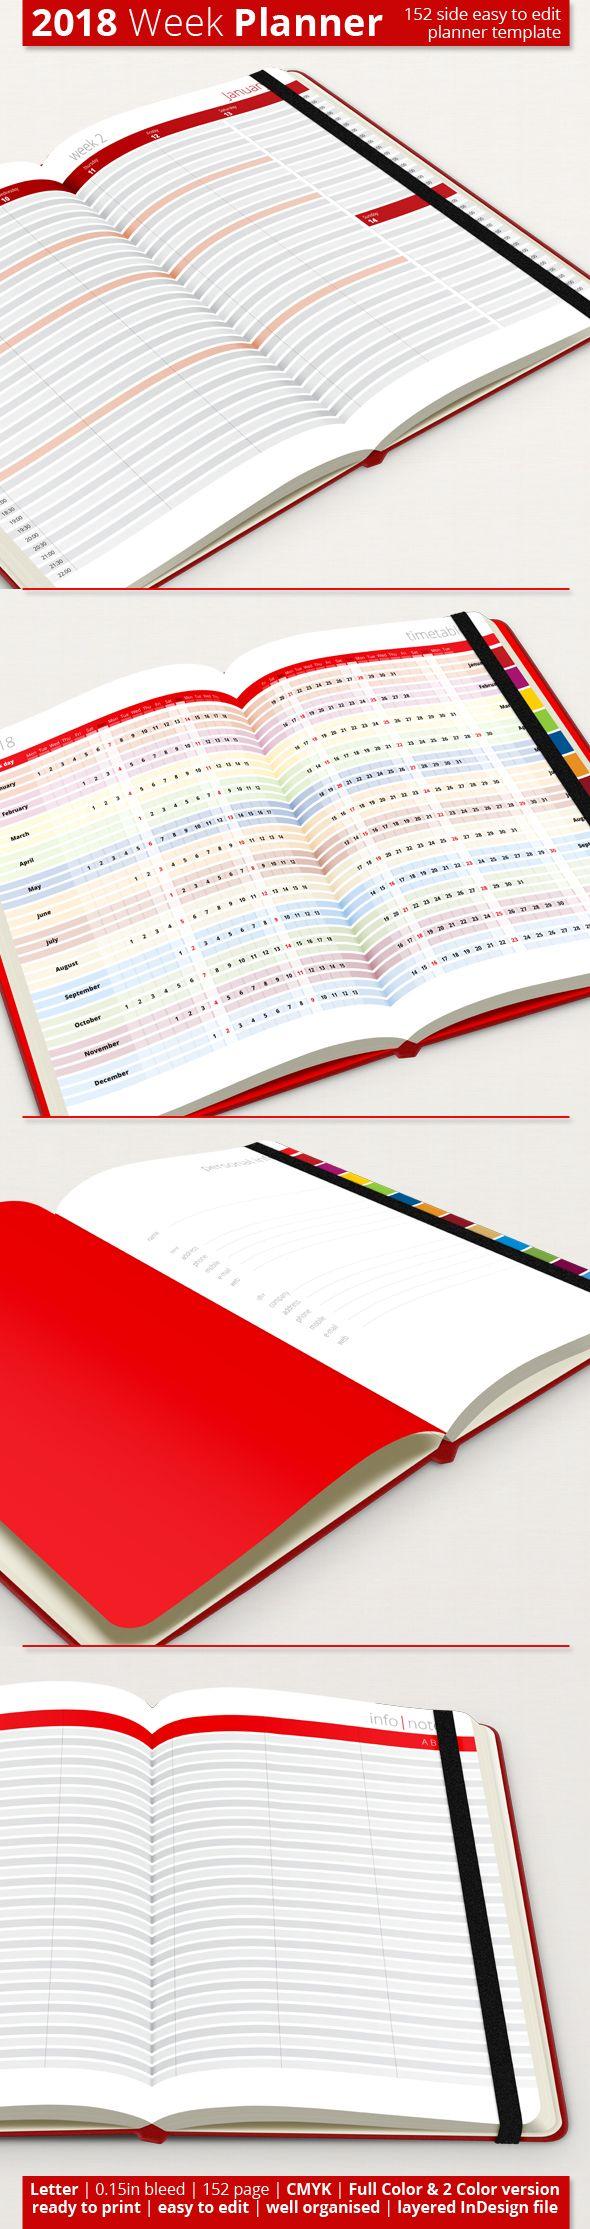 Mejores 15 imágenes de Calendar / Planner en Pinterest ...